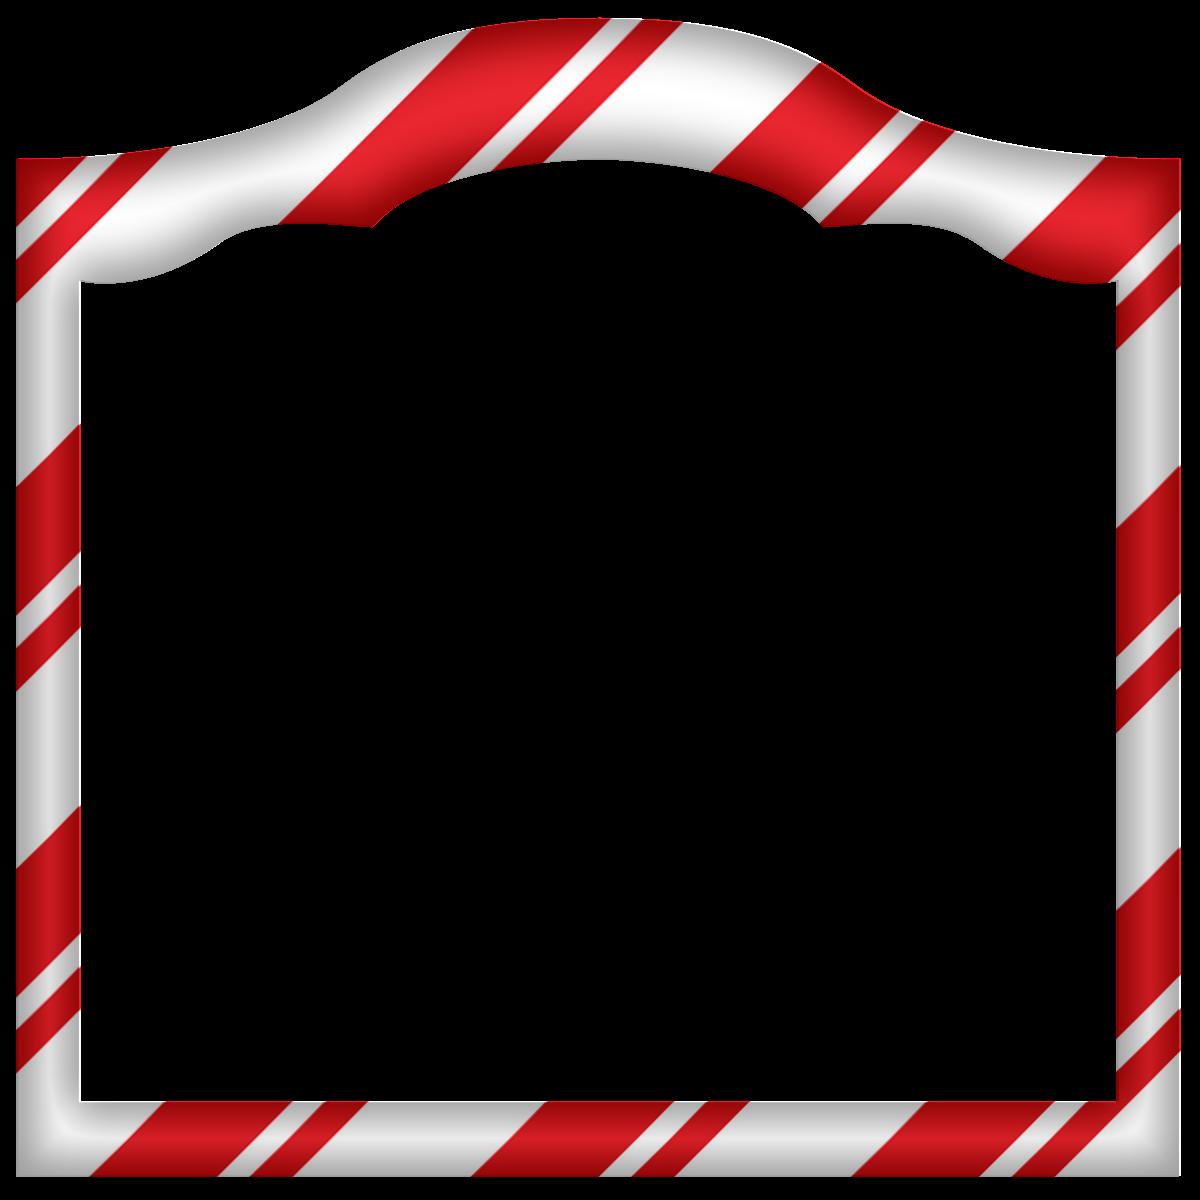 Granny Enchanted S Blog Free Christmas Kit Papers